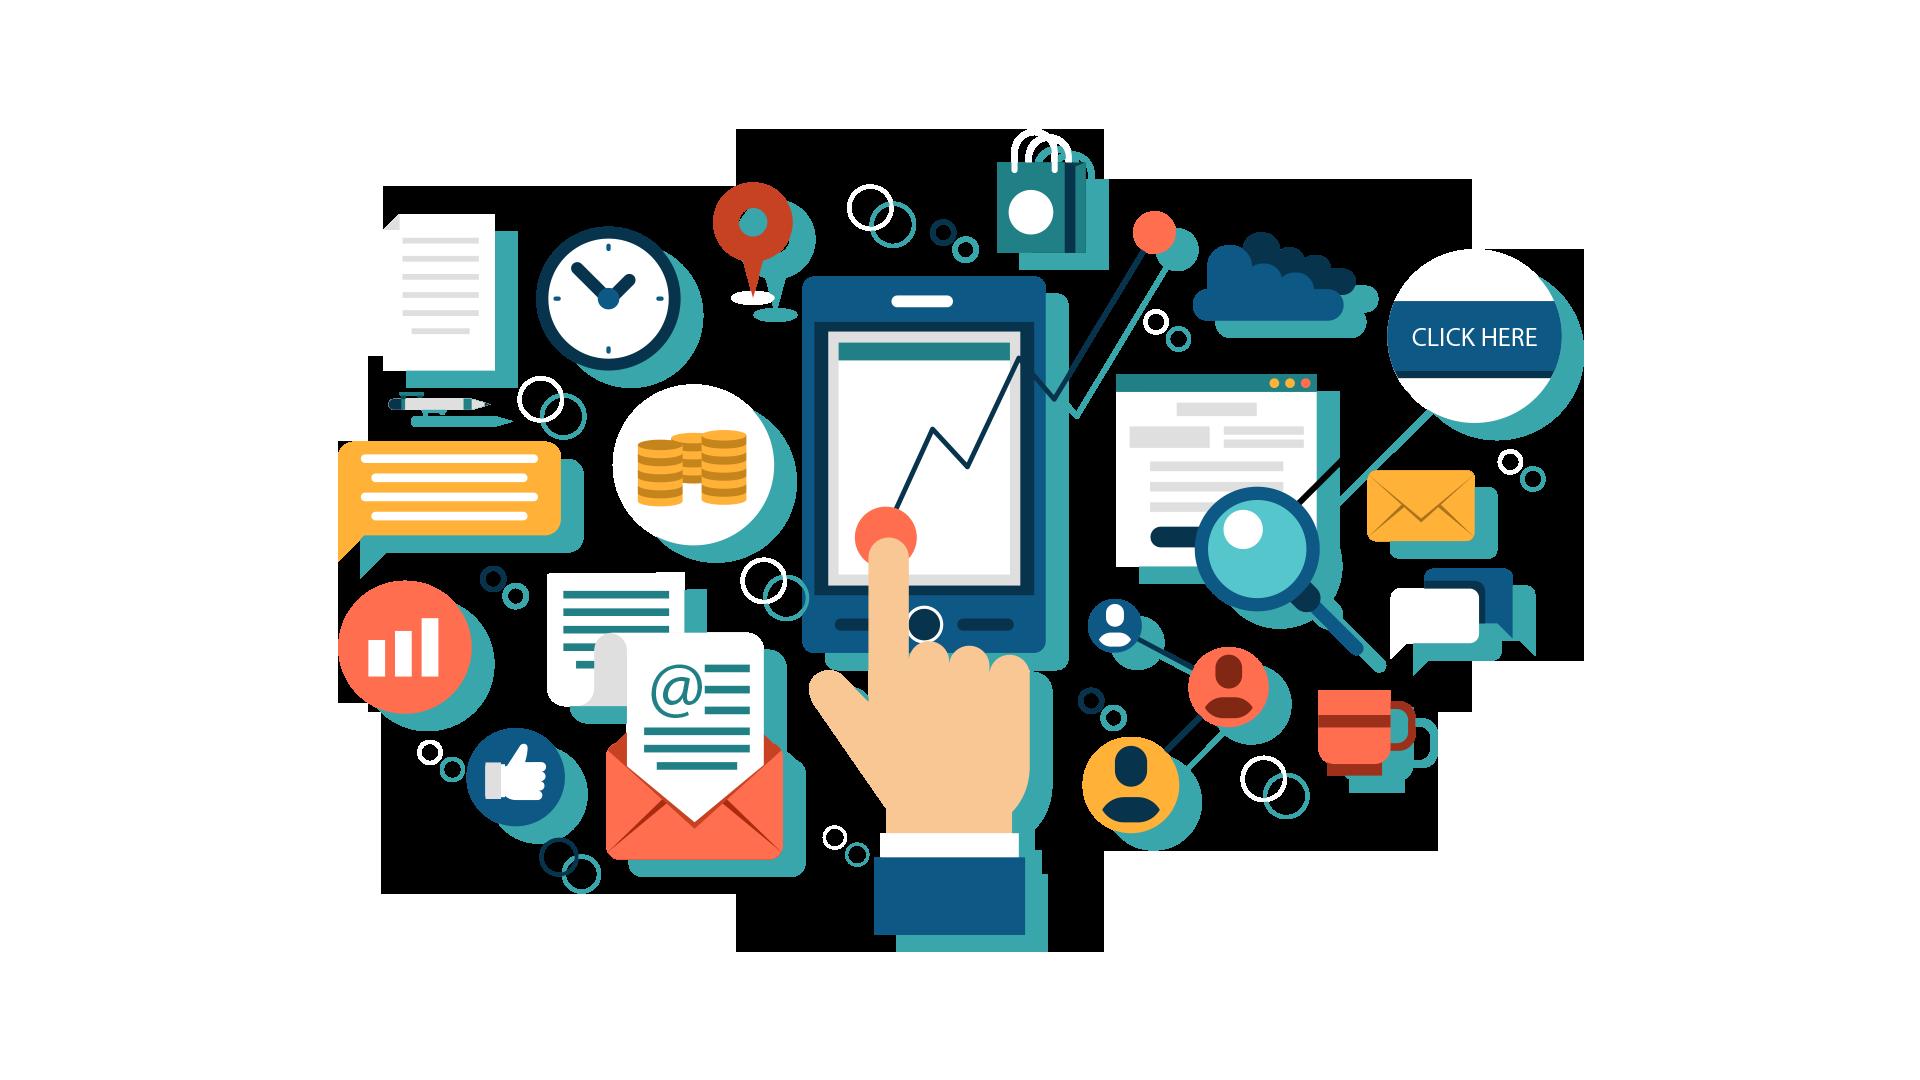 Open Campus cerca un Digital Marketing Manager